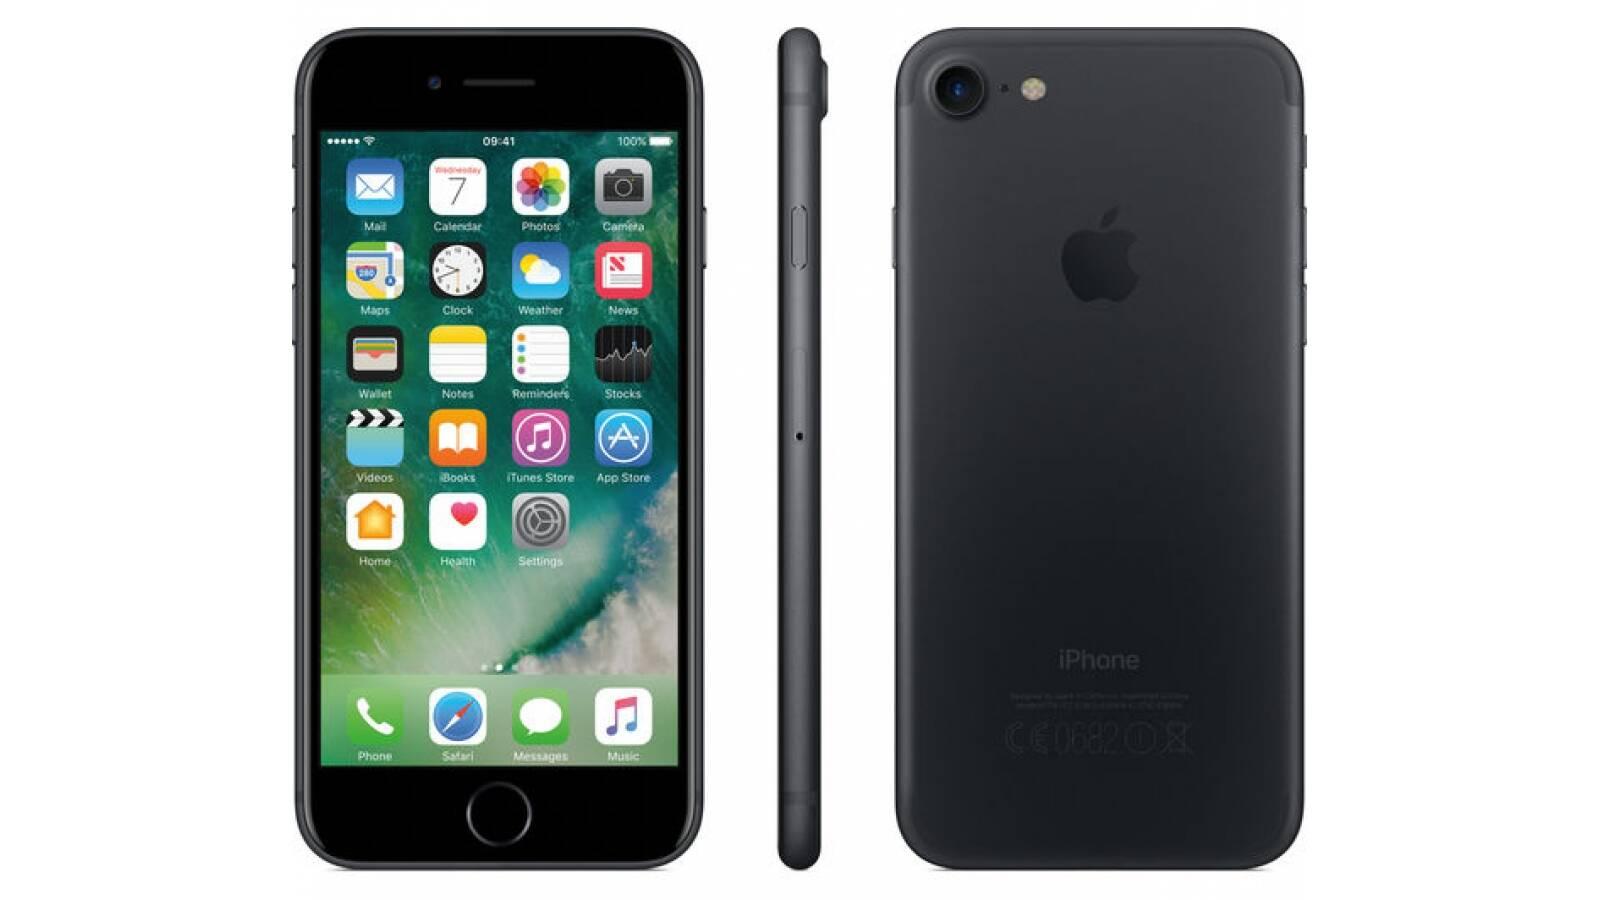 Celular Apple Iphone 7 256GB libre para Antel/Claro/Movistar (Black)